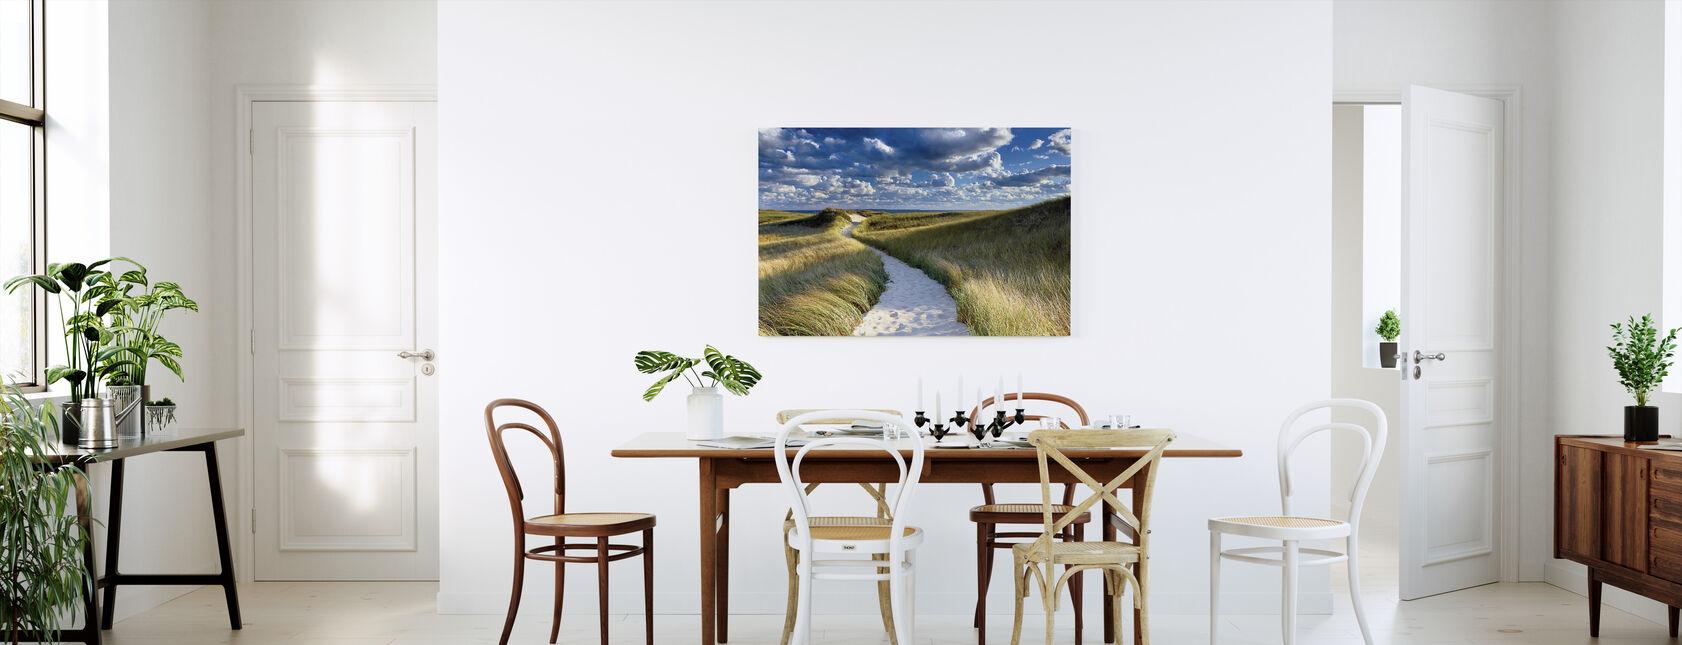 Philbin Beach - Billede på lærred - Køkken